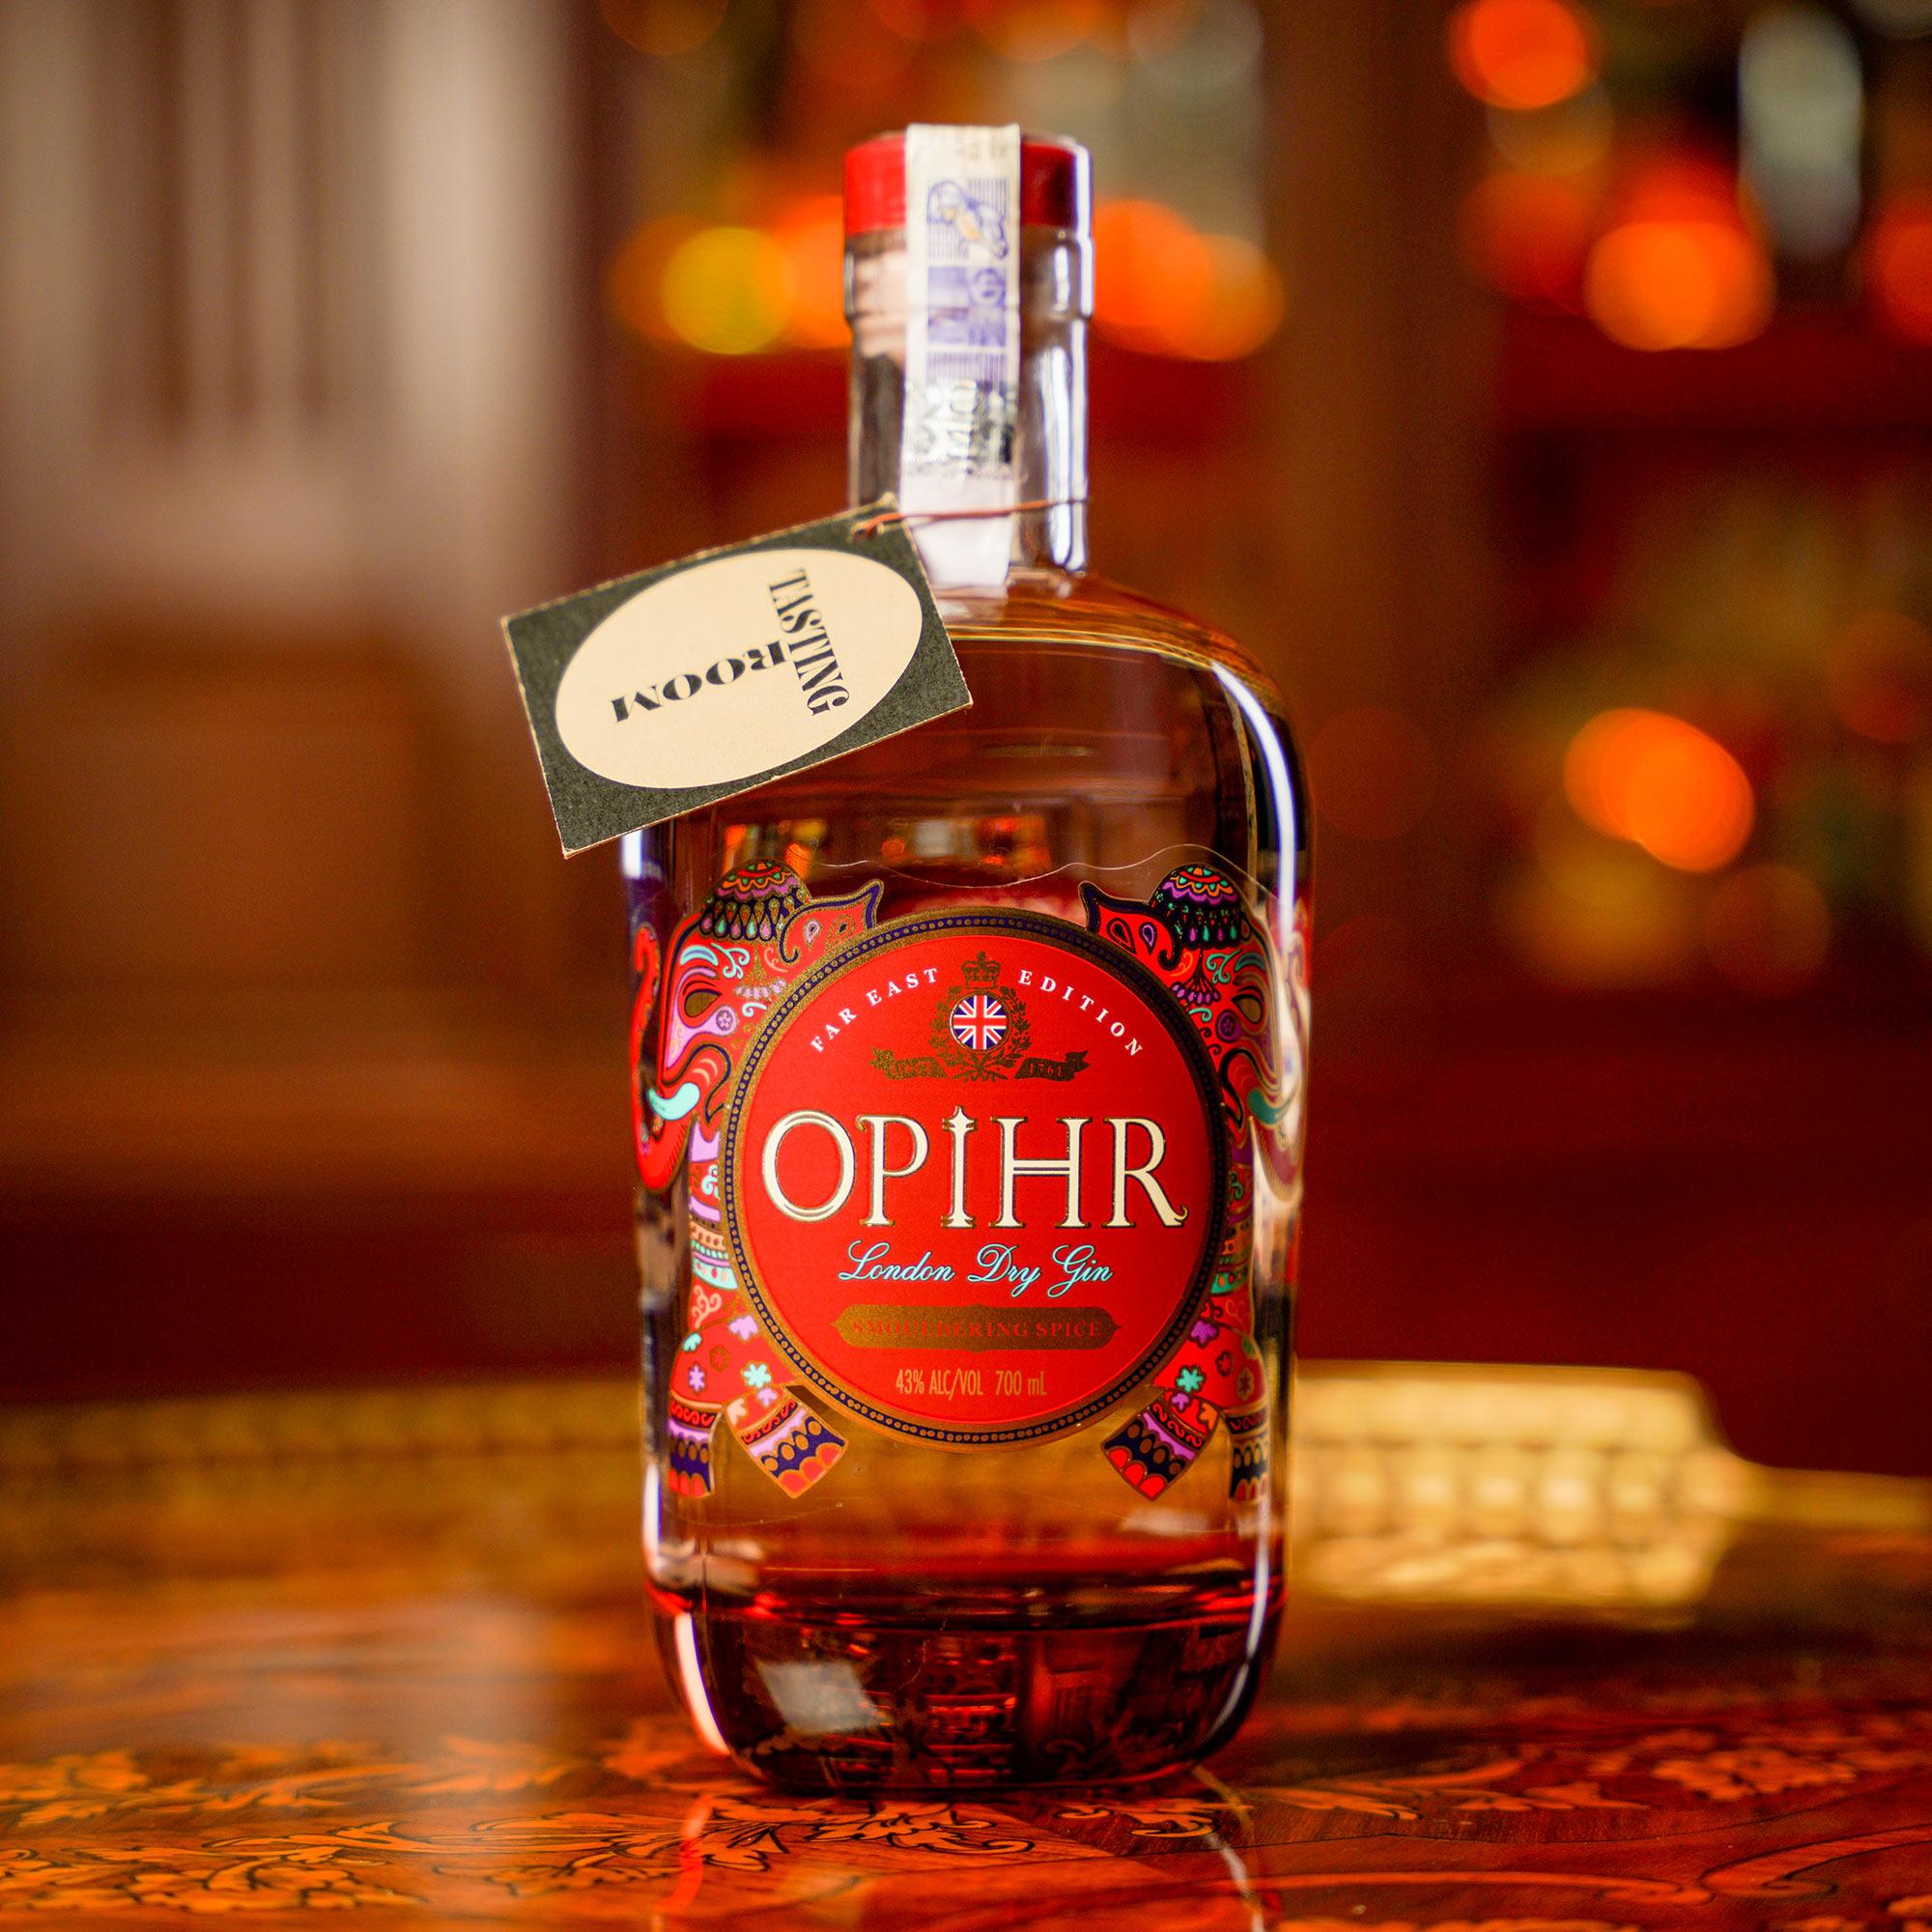 Opihr Smouldering Spice Far East Edition Gin /Опир Сечуански пипер Далечен Изток Джин